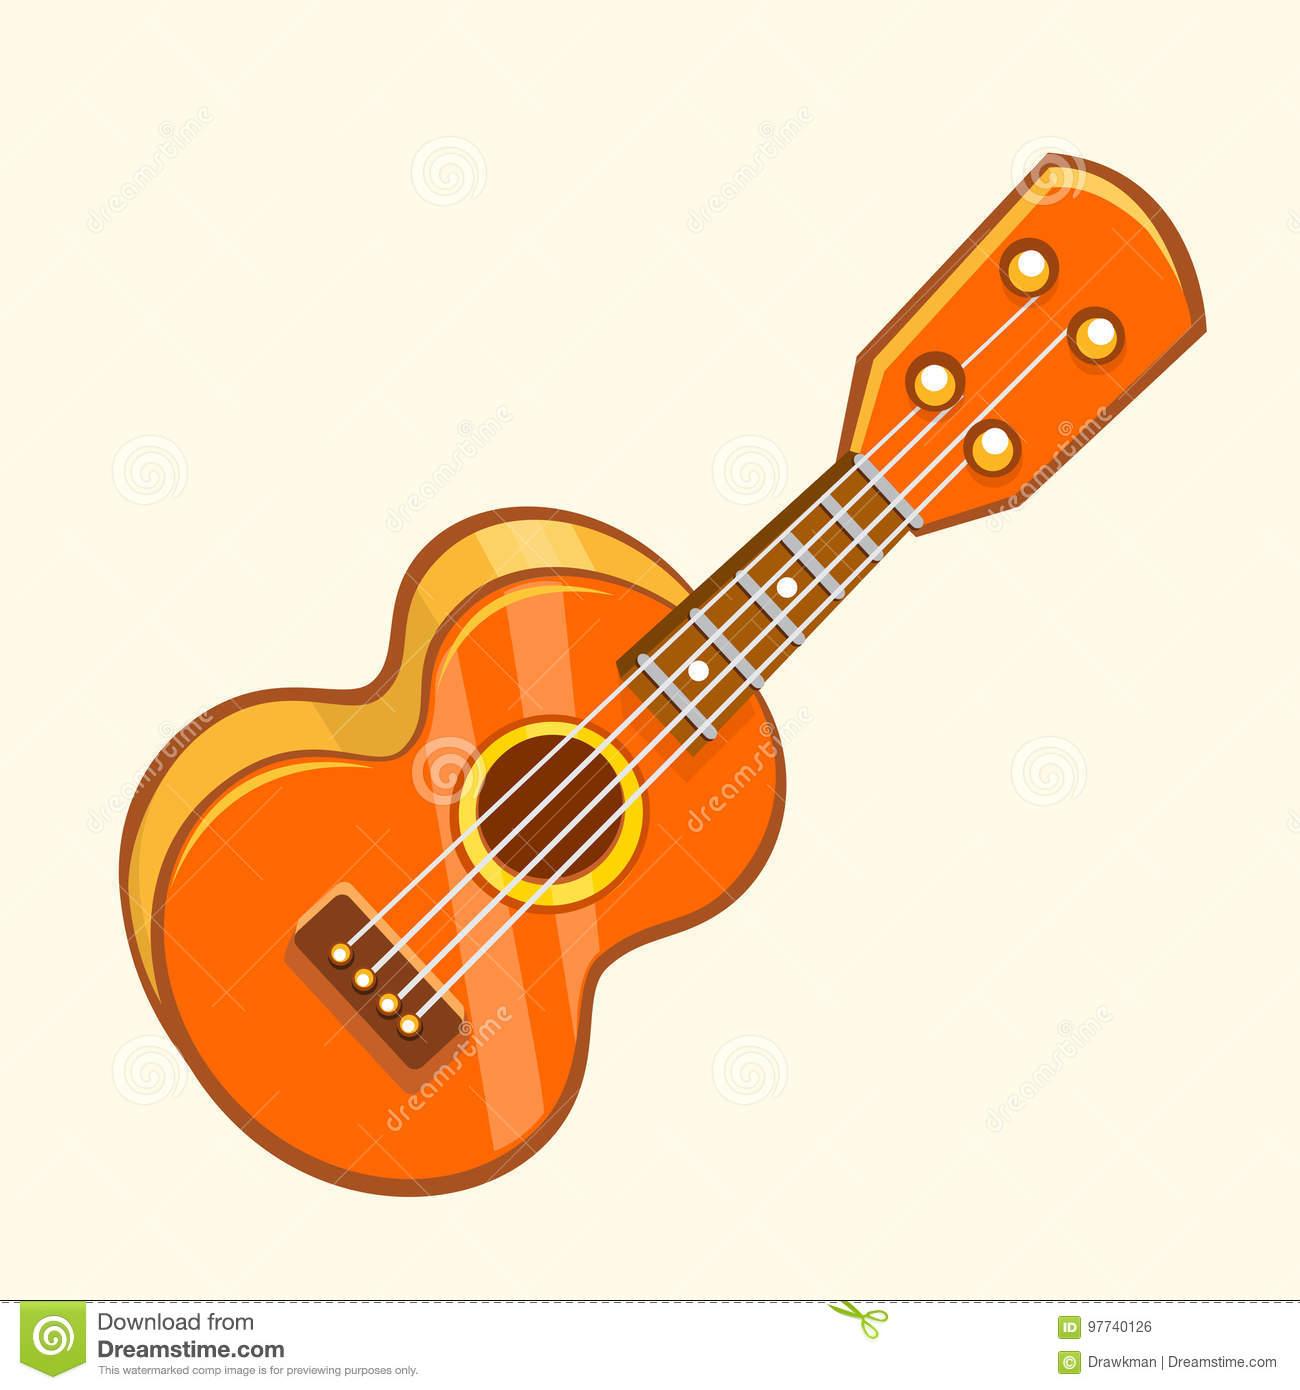 Cartoon Vector Illustration Of Acoustic Guitar Or Ukulele. Cartoon.